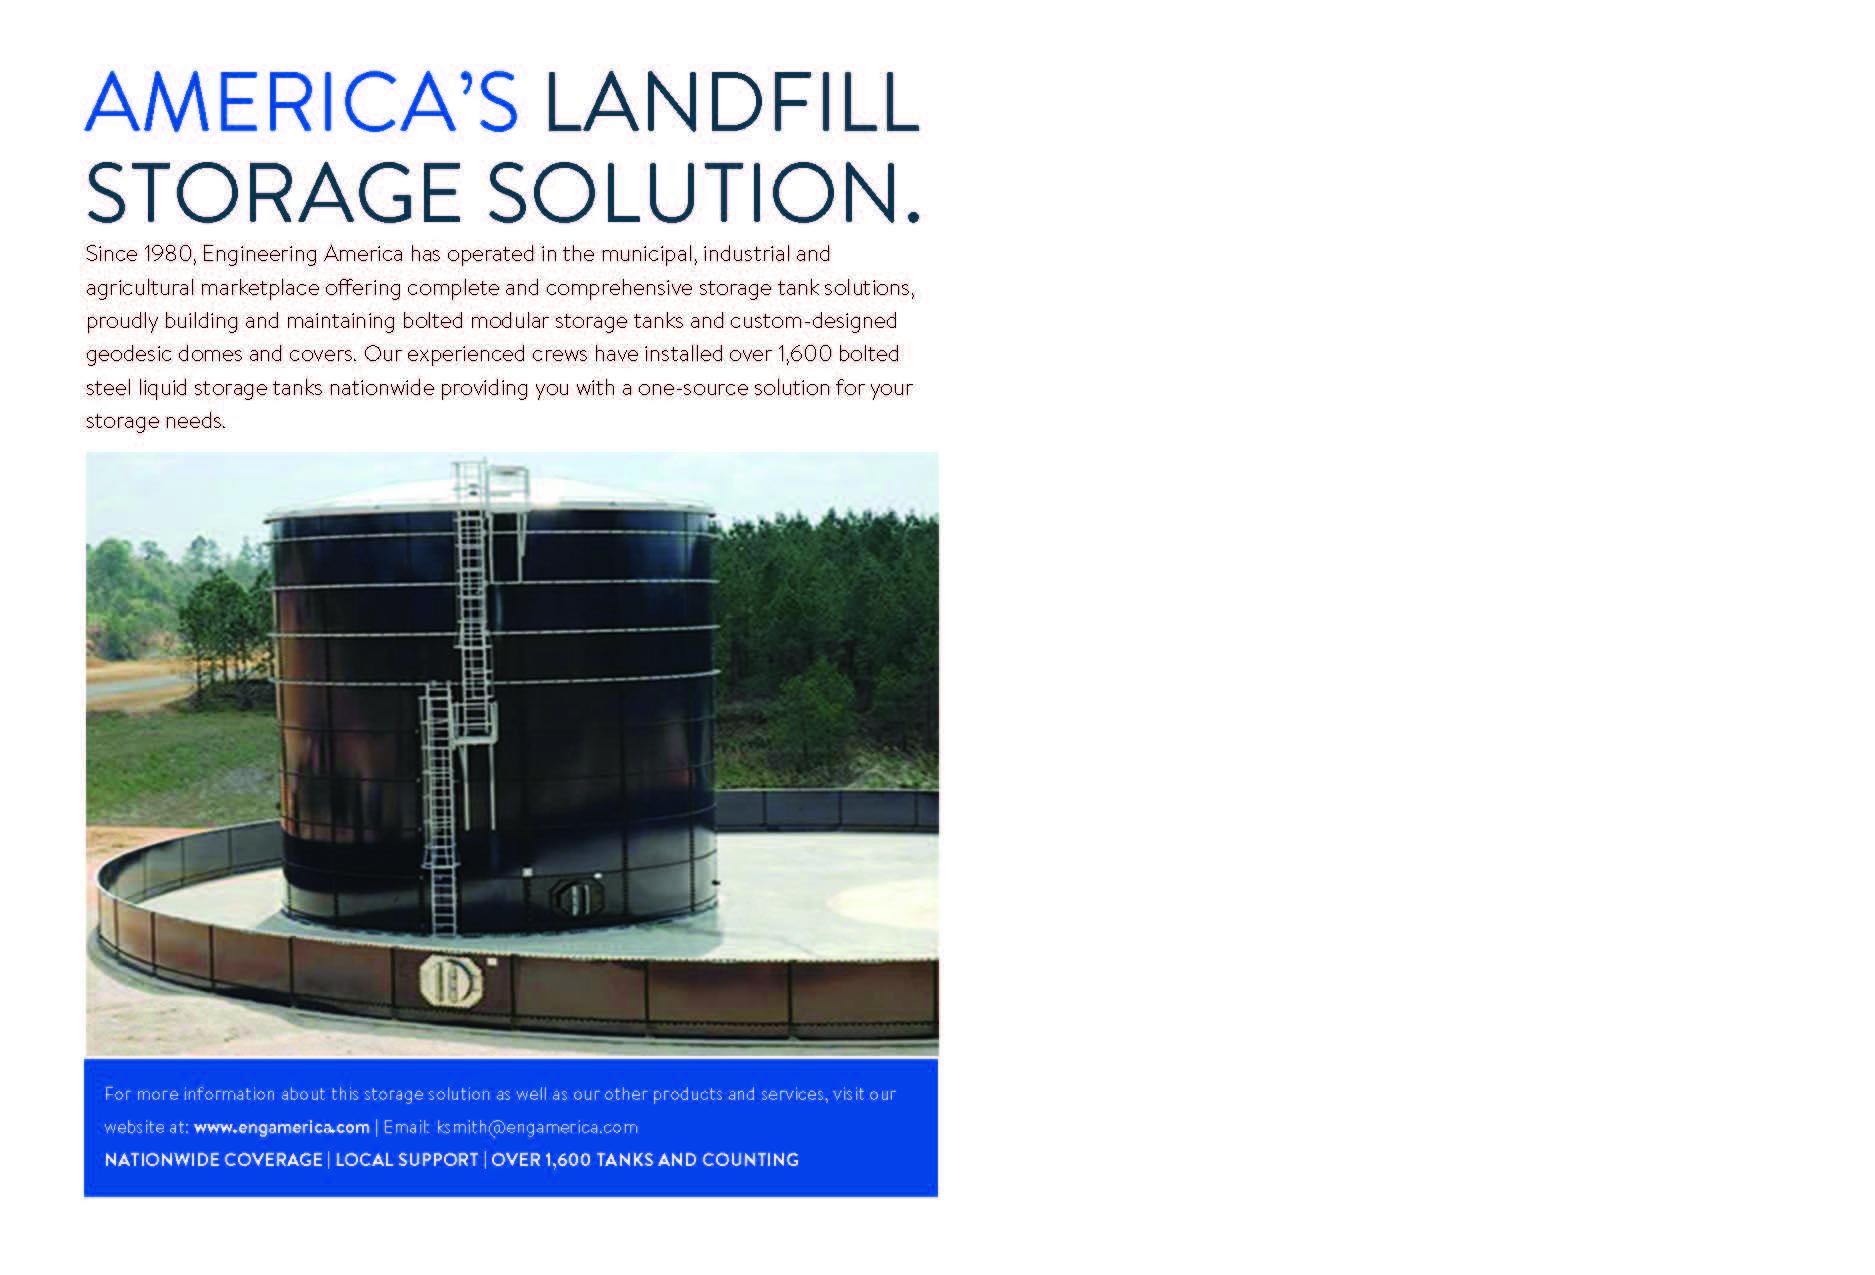 LANDFILL postcard front & back 2017_Page_2.jpg